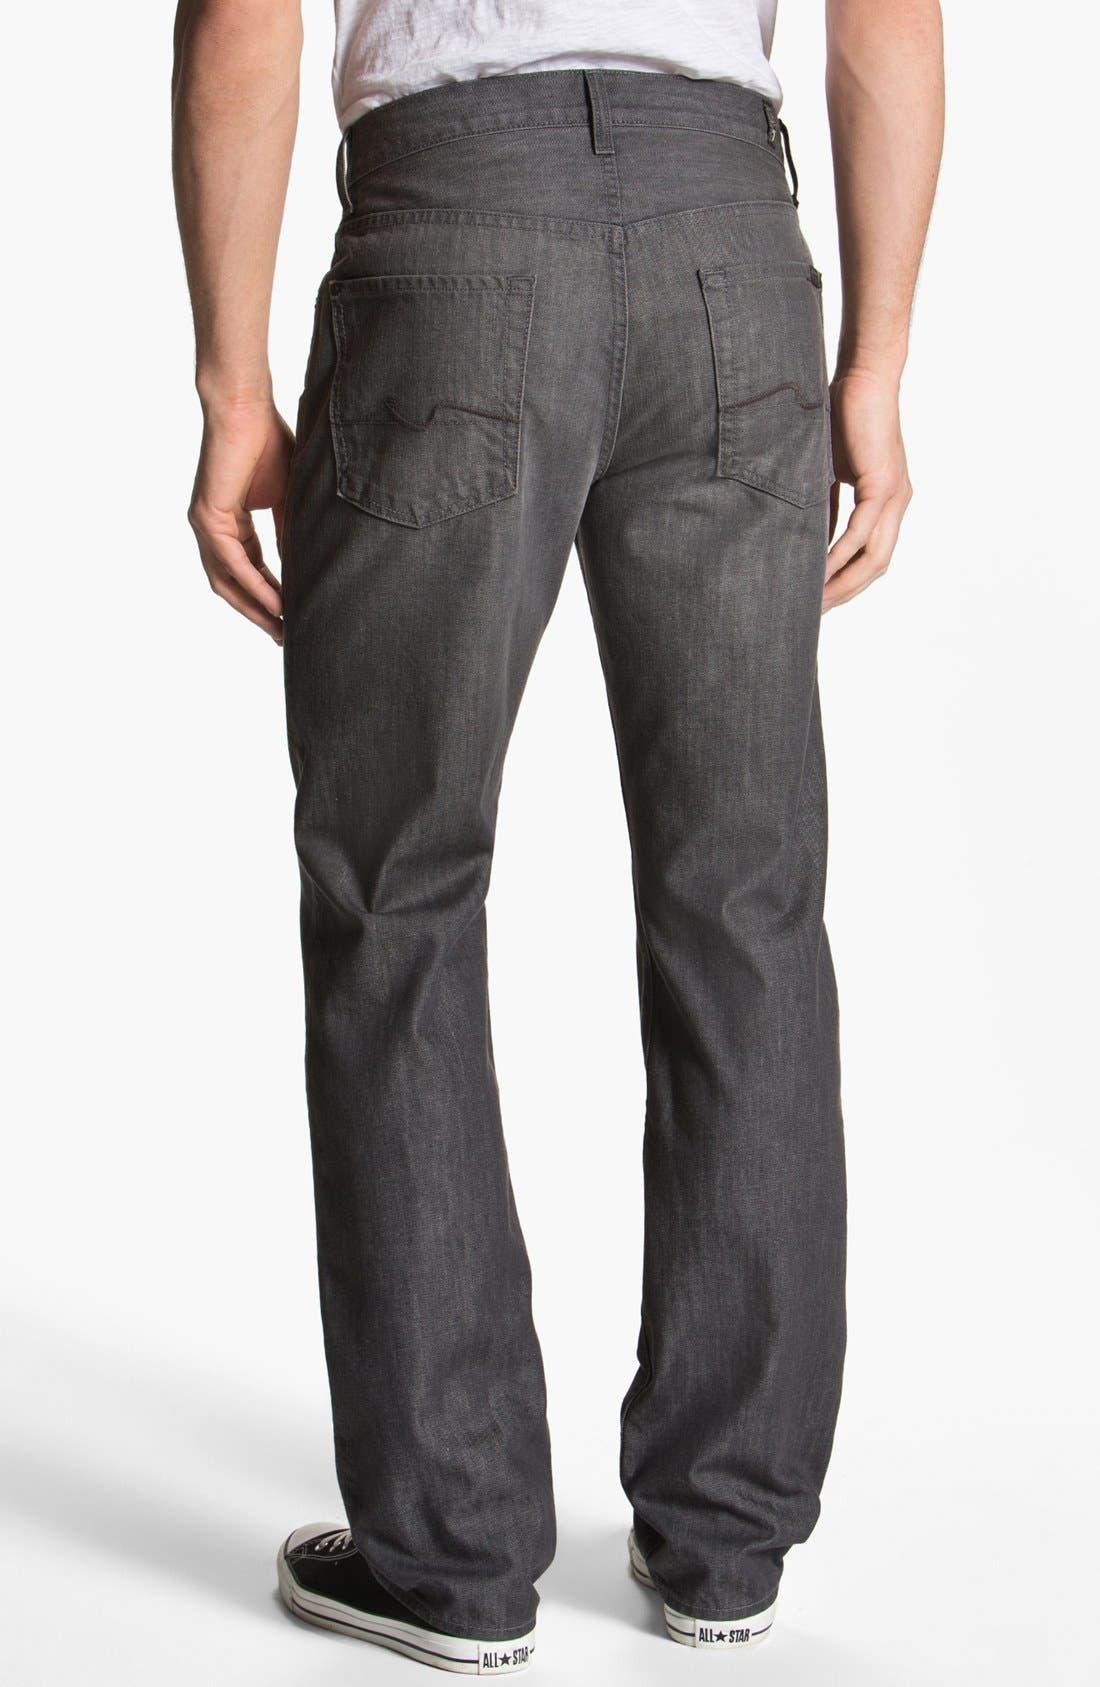 Alternate Image 1 Selected - 7 For All Mankind® 'Carsen' Straight Leg Jeans (Sulfur Springs)